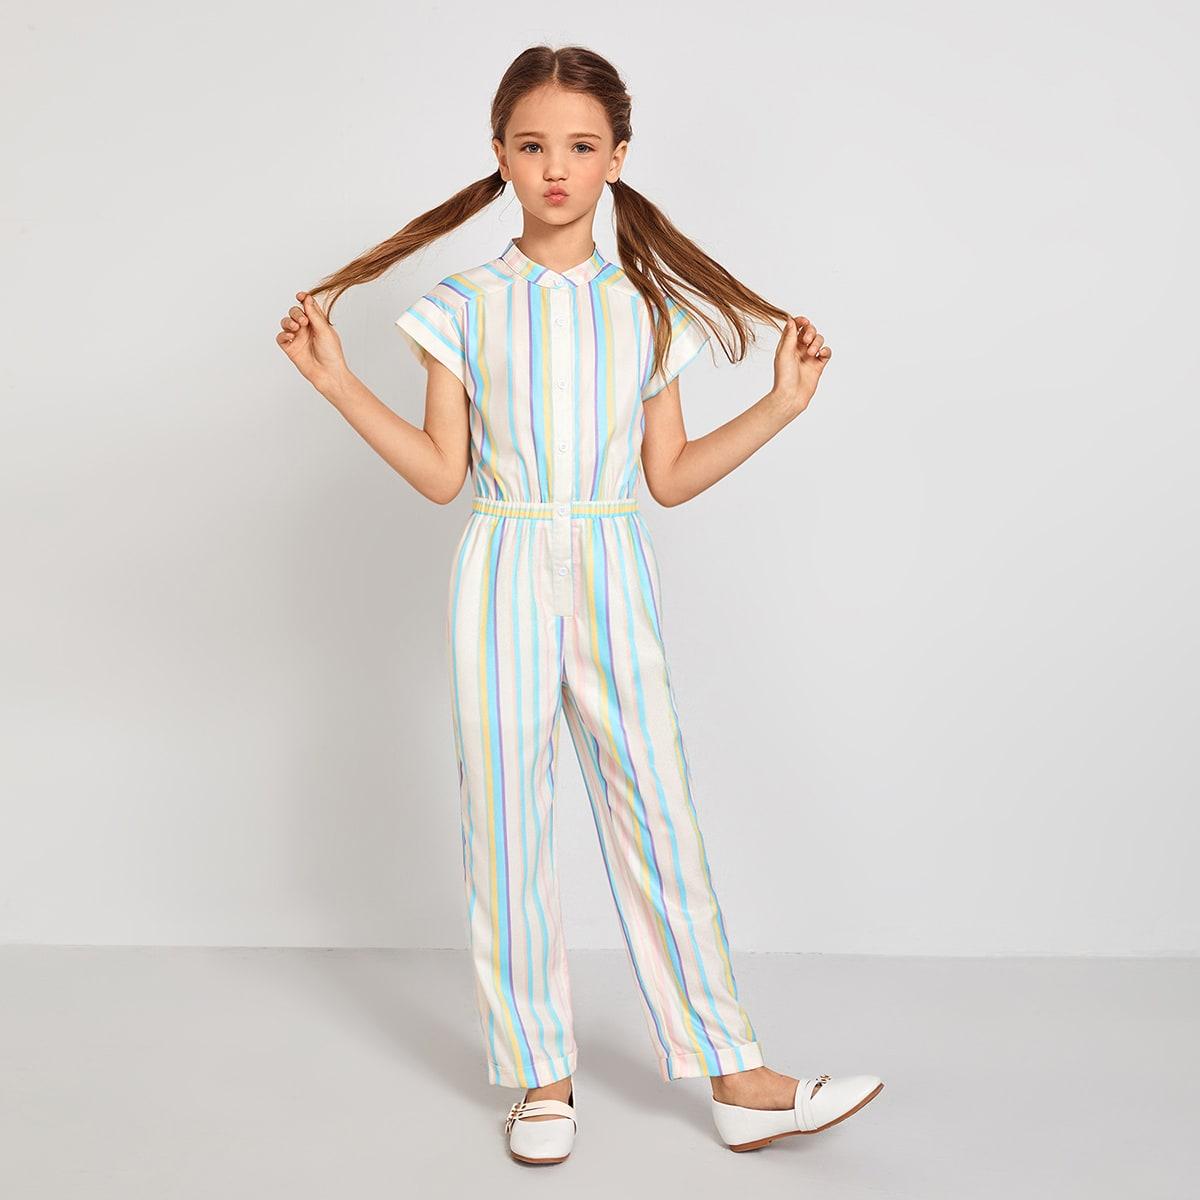 SHEIN / Girls Button Front Striped Shirt Jumpsuit